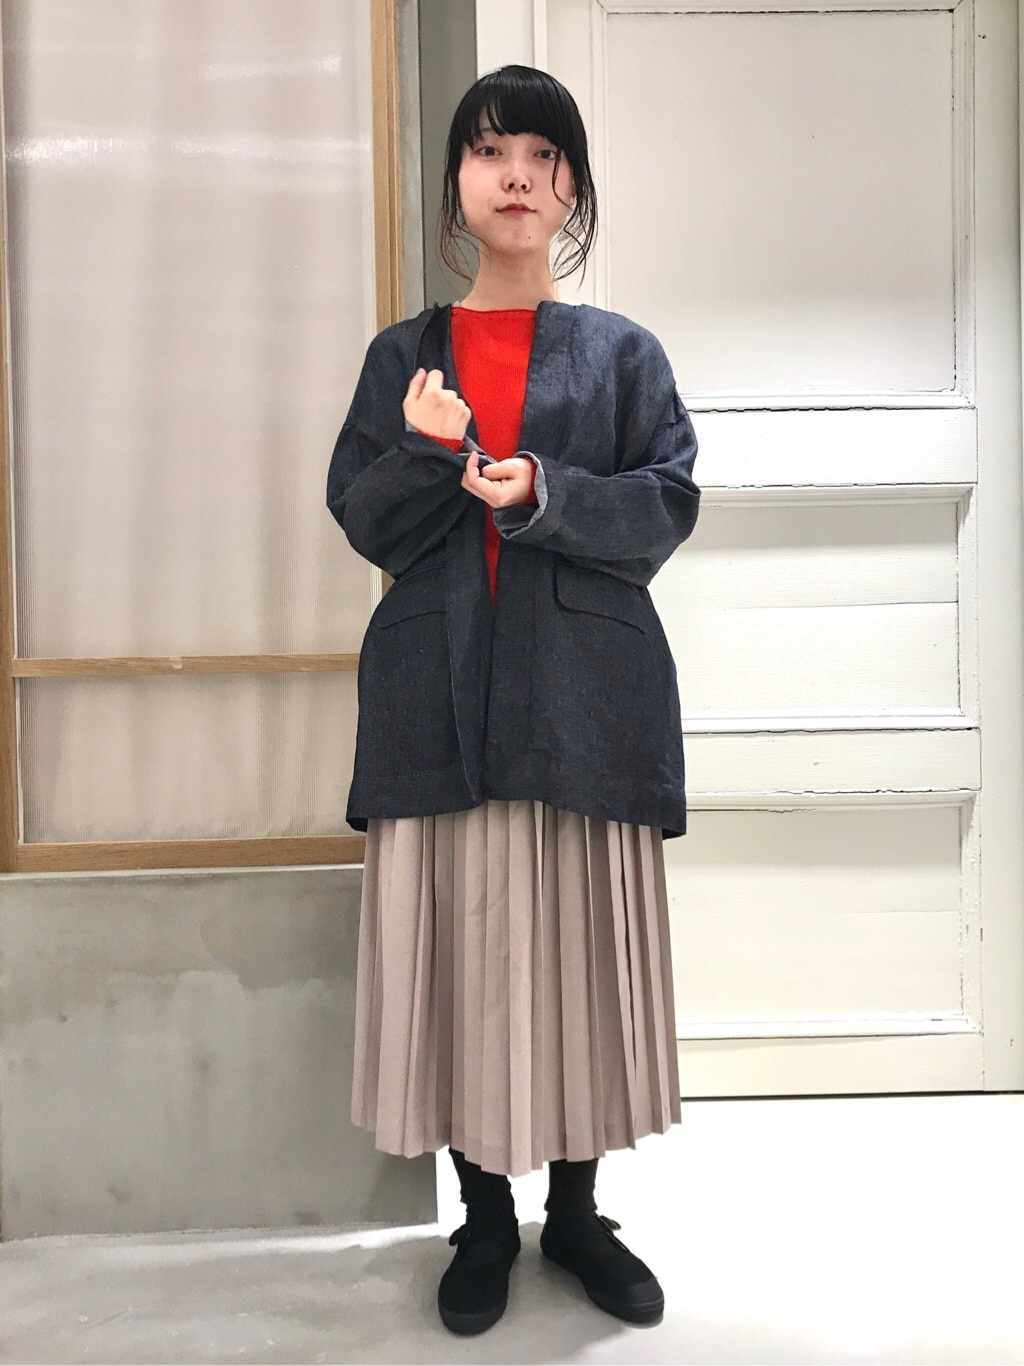 bulle de savon 渋谷スクランブルスクエア 身長:153cm 2020.02.19